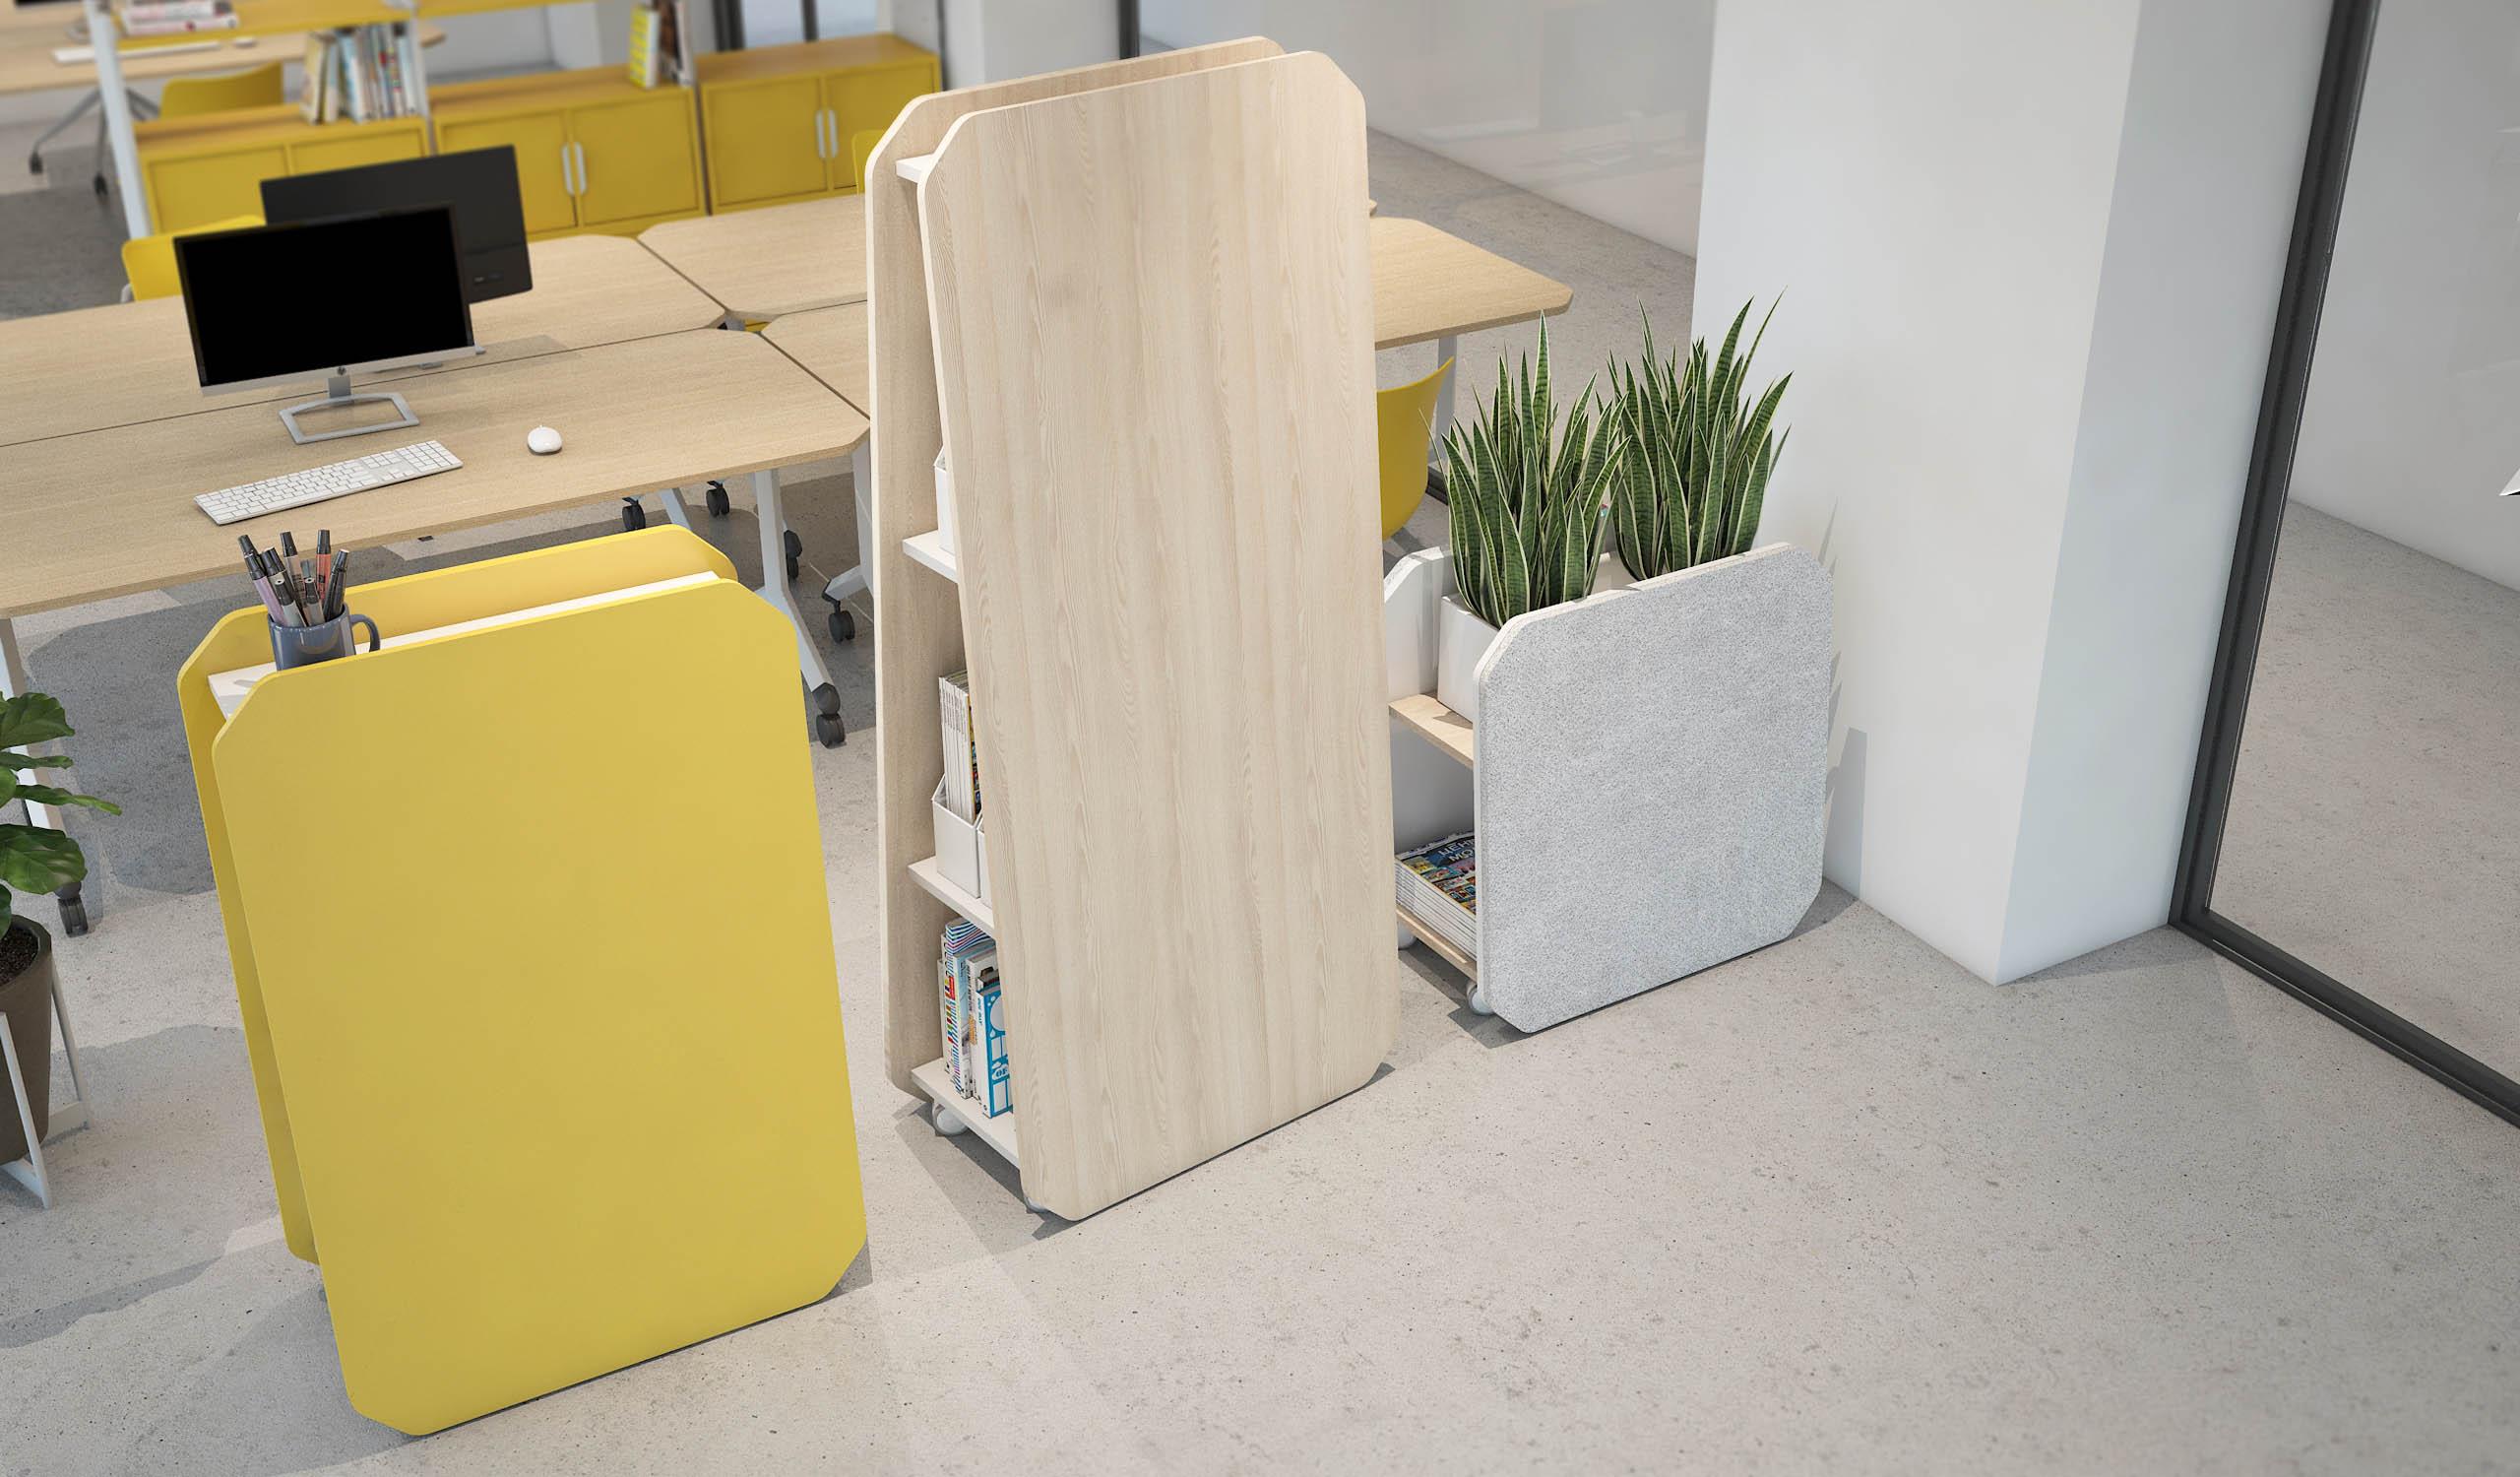 Vintiquatre Colecciones Tóteem Teepee Plygu Ulkia collage office almacenaje producto mobiliario diseño